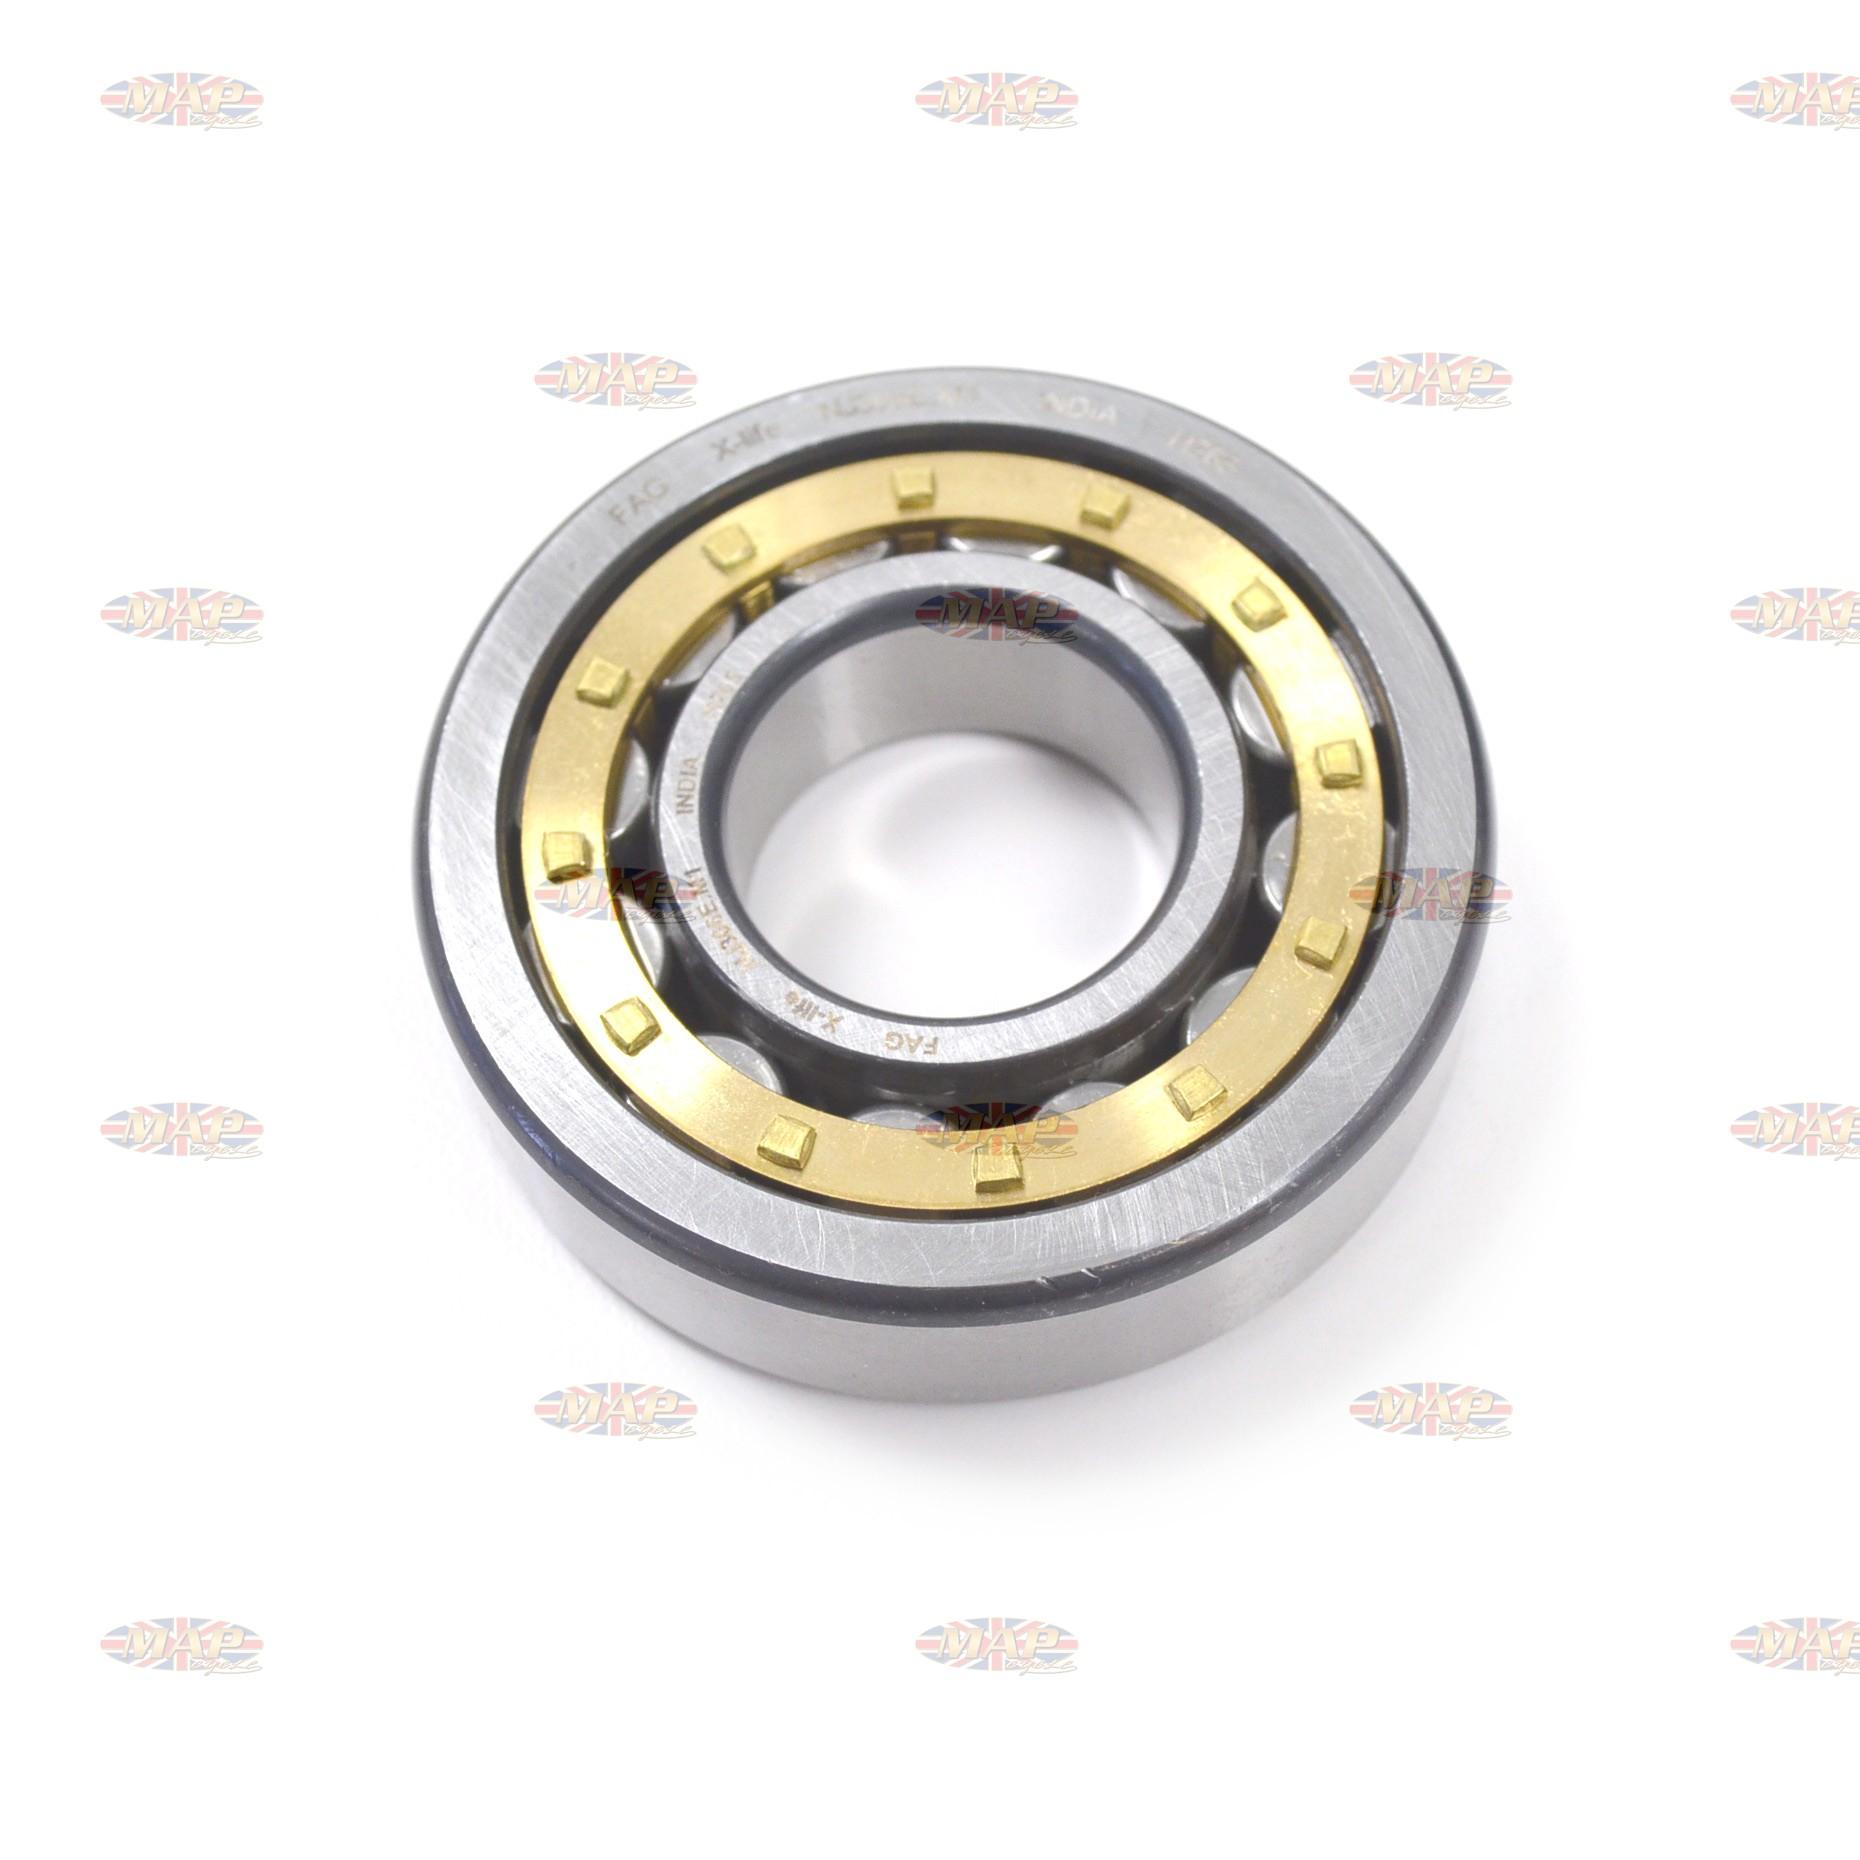 Norton Superblend Roller Main Crankshaft Bearing FAG Brass Cage 06-4118